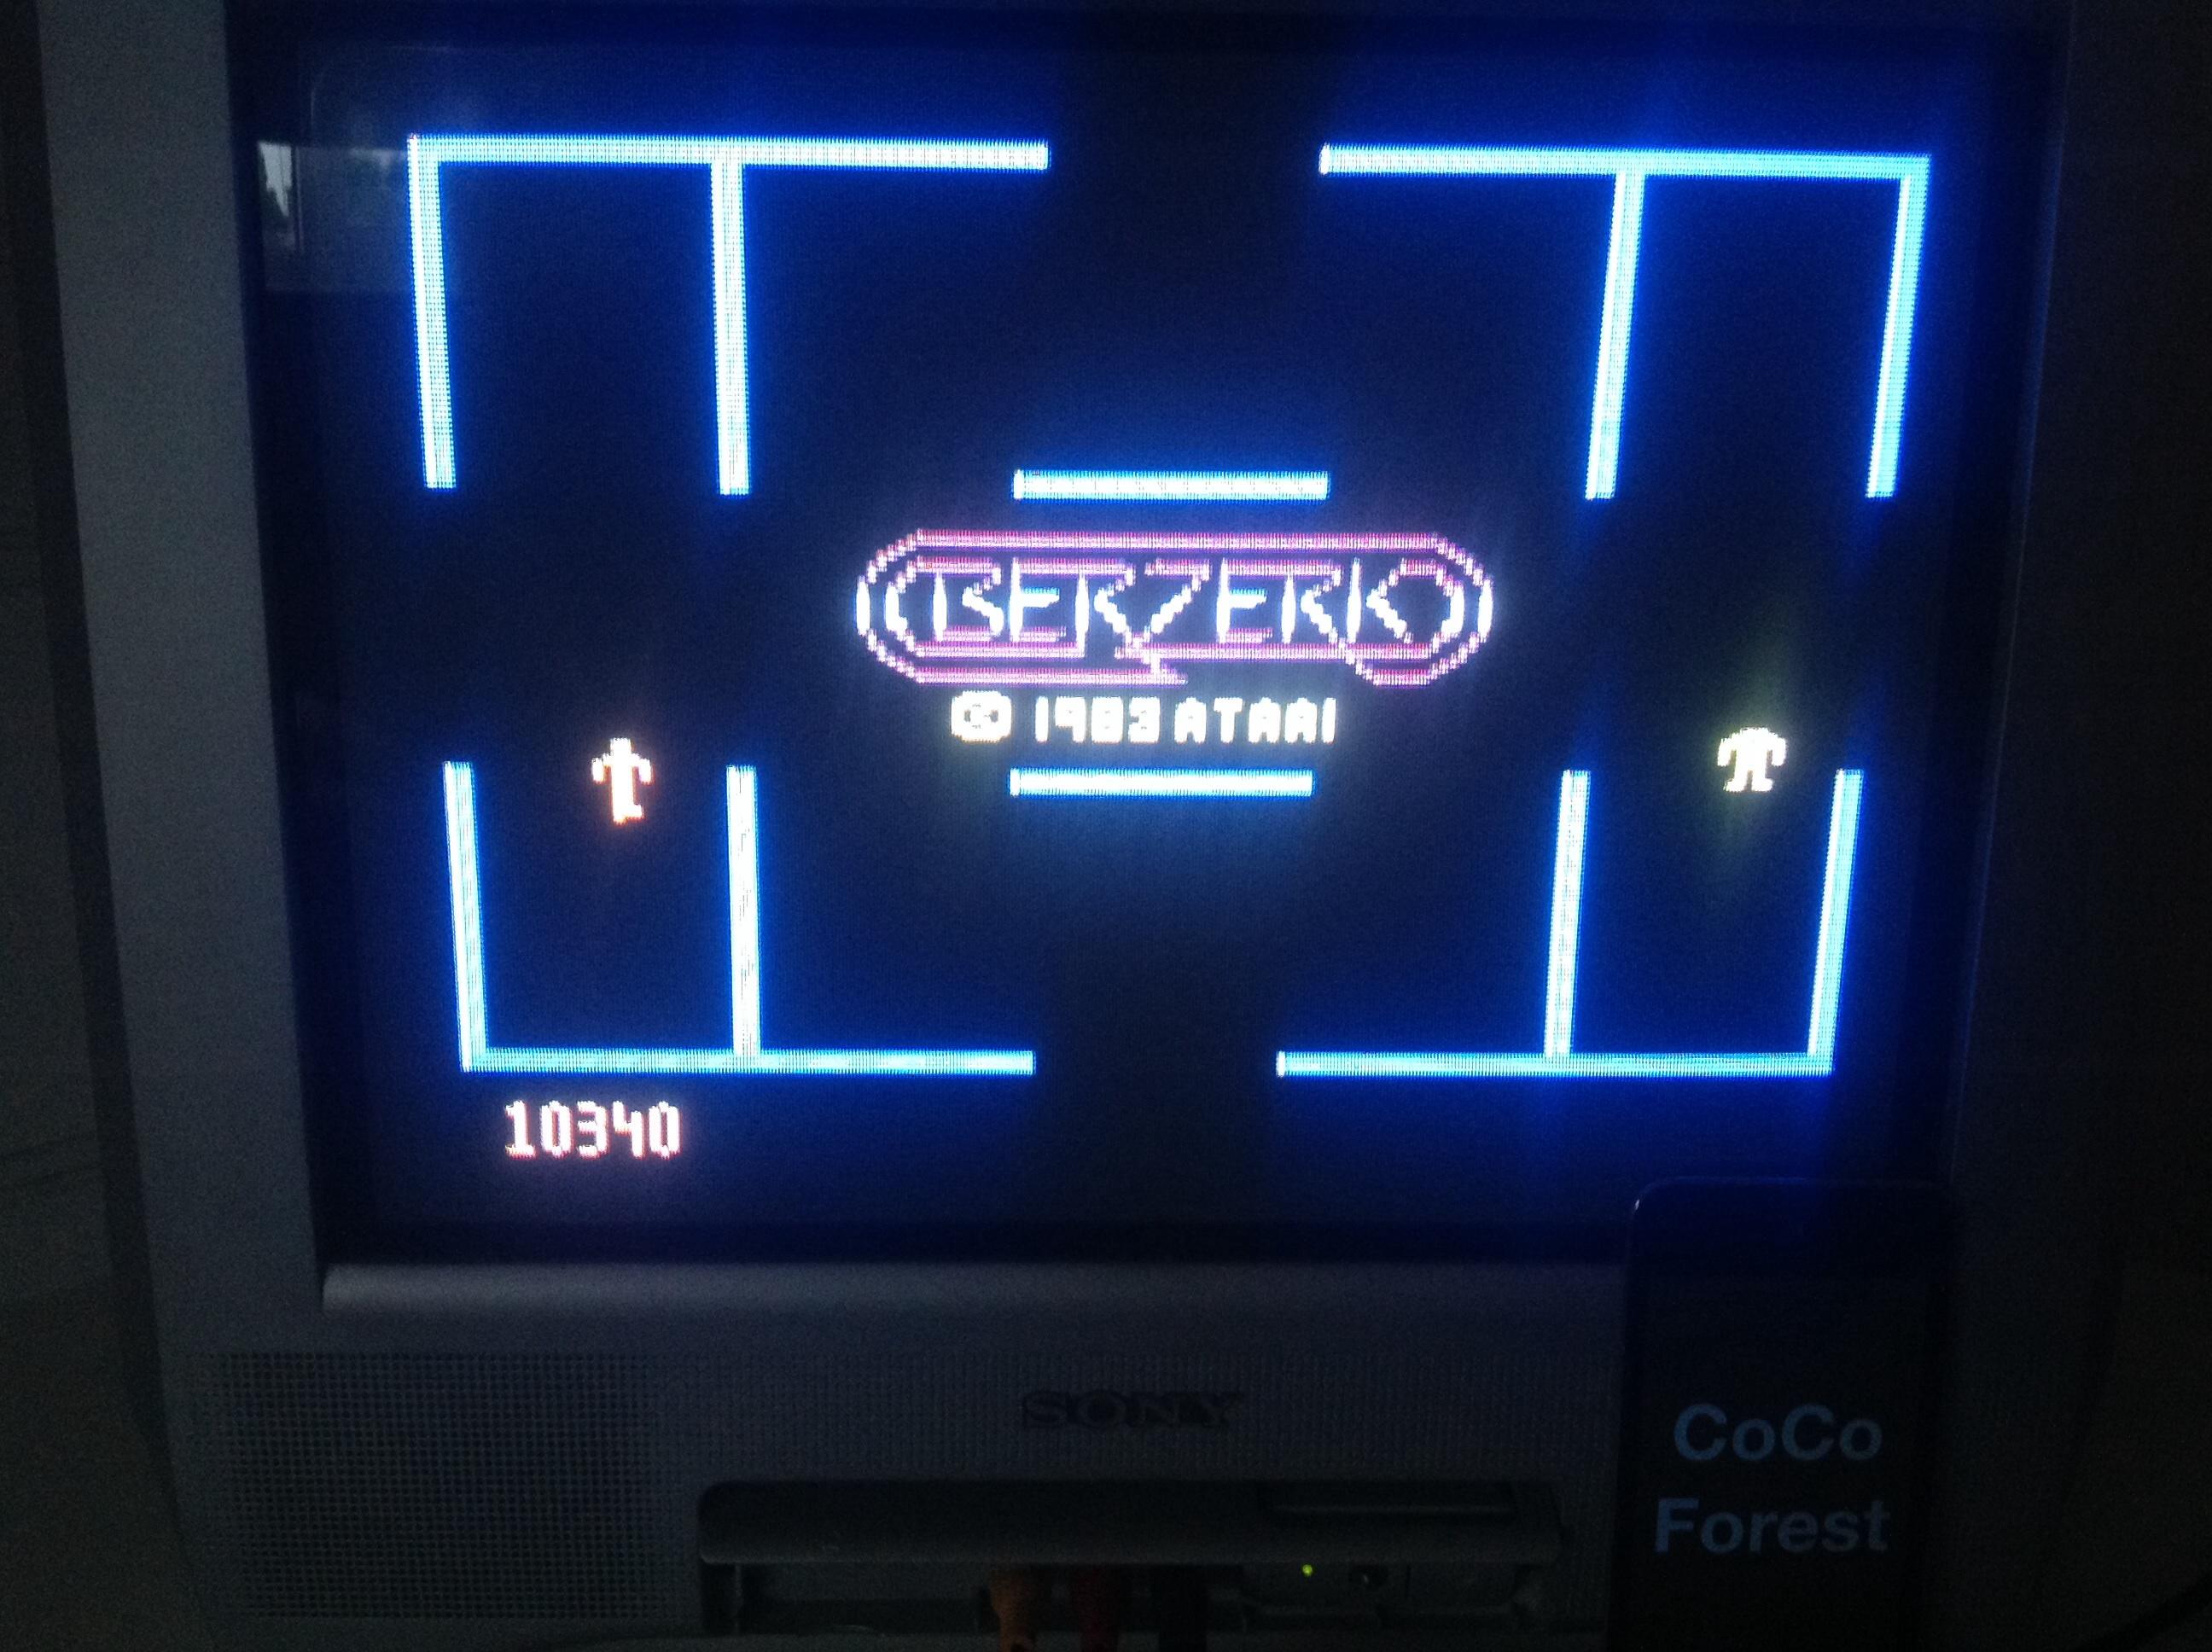 CoCoForest: Berzerk: Game 1 (Atari 5200) 10,340 points on 2014-05-19 14:29:45